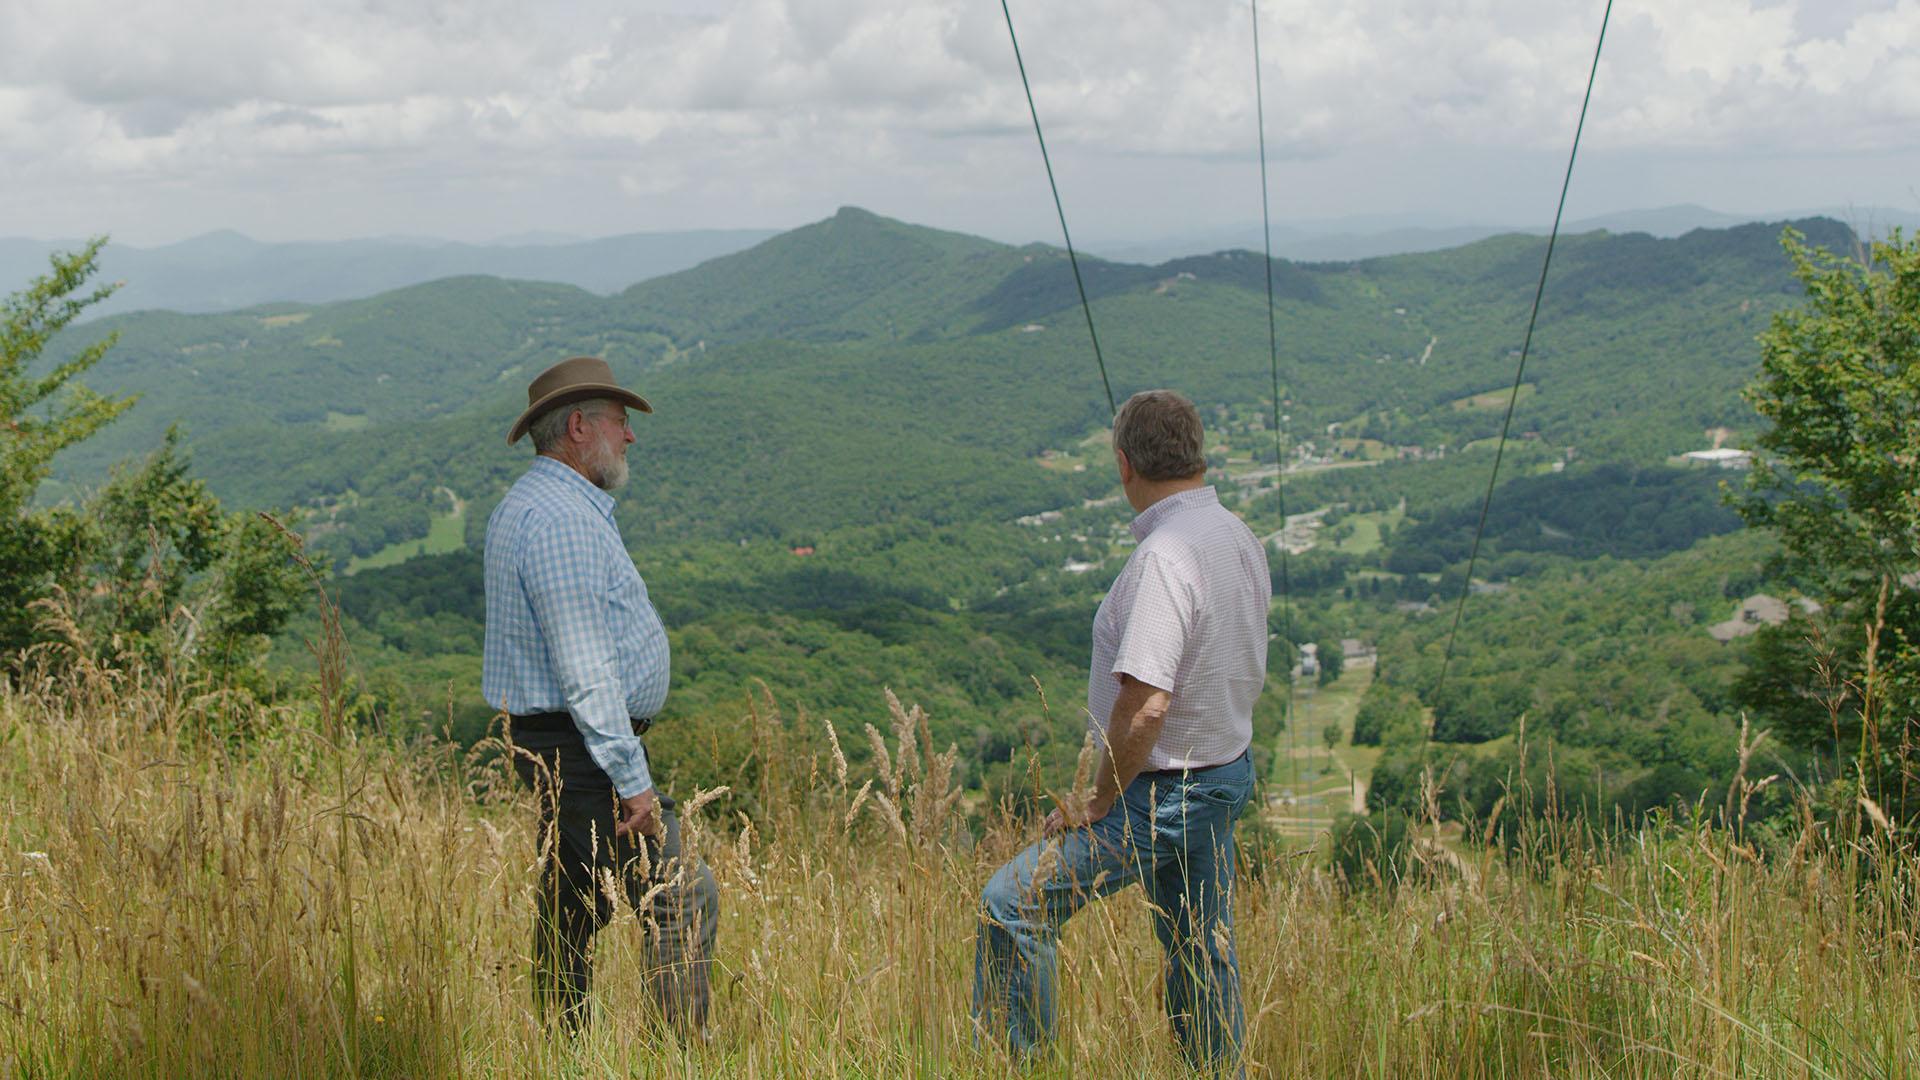 nowsay-sugar-mountain-documentary-heres-to-50-gunther-warren